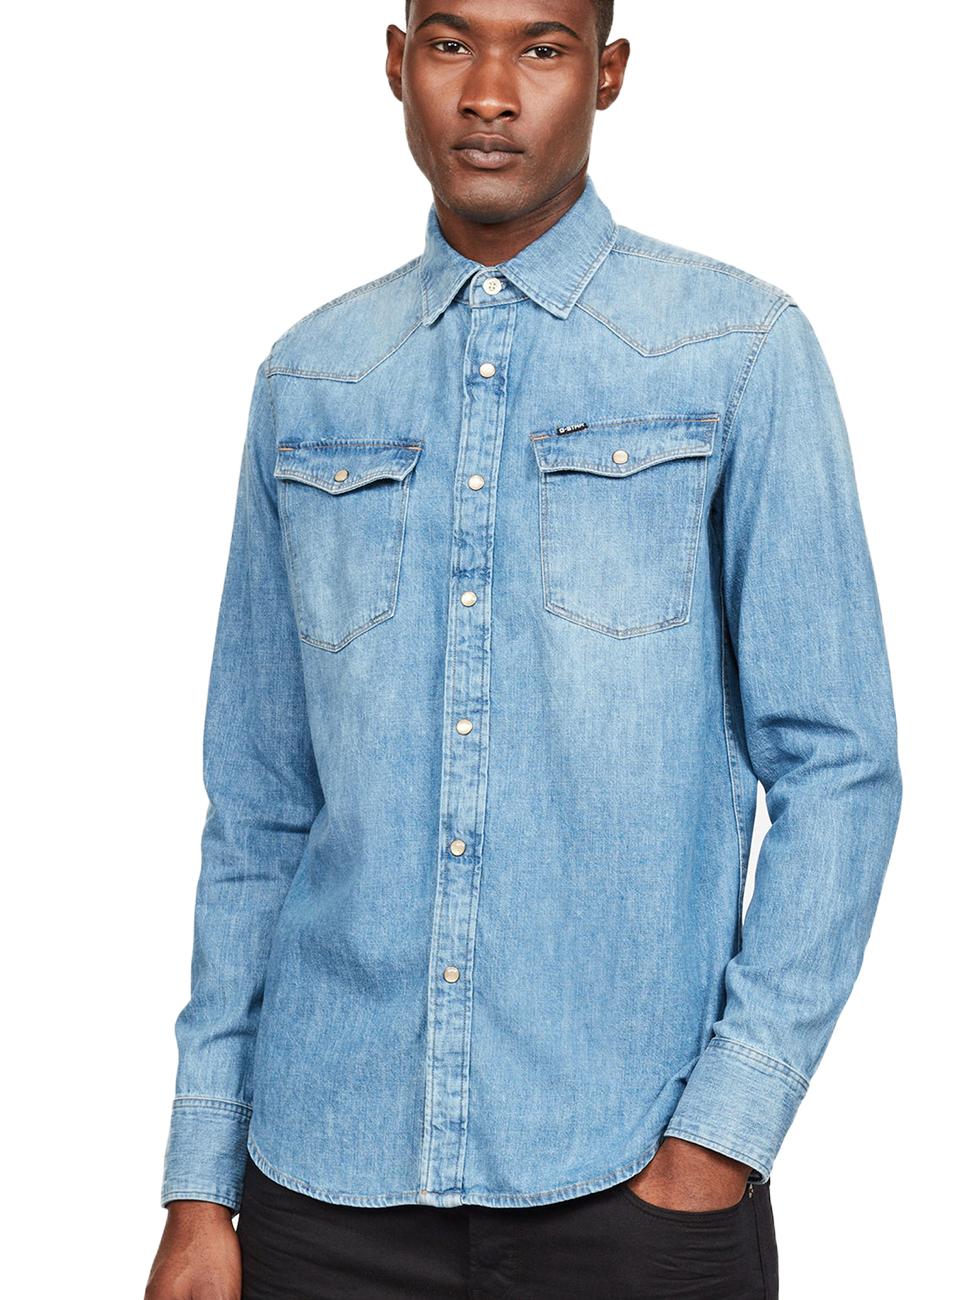 G-Star Herren Jeanshemd 3301 - Slim Fit kaufen - JEANS-DIRECT.DE 63f5085aa0